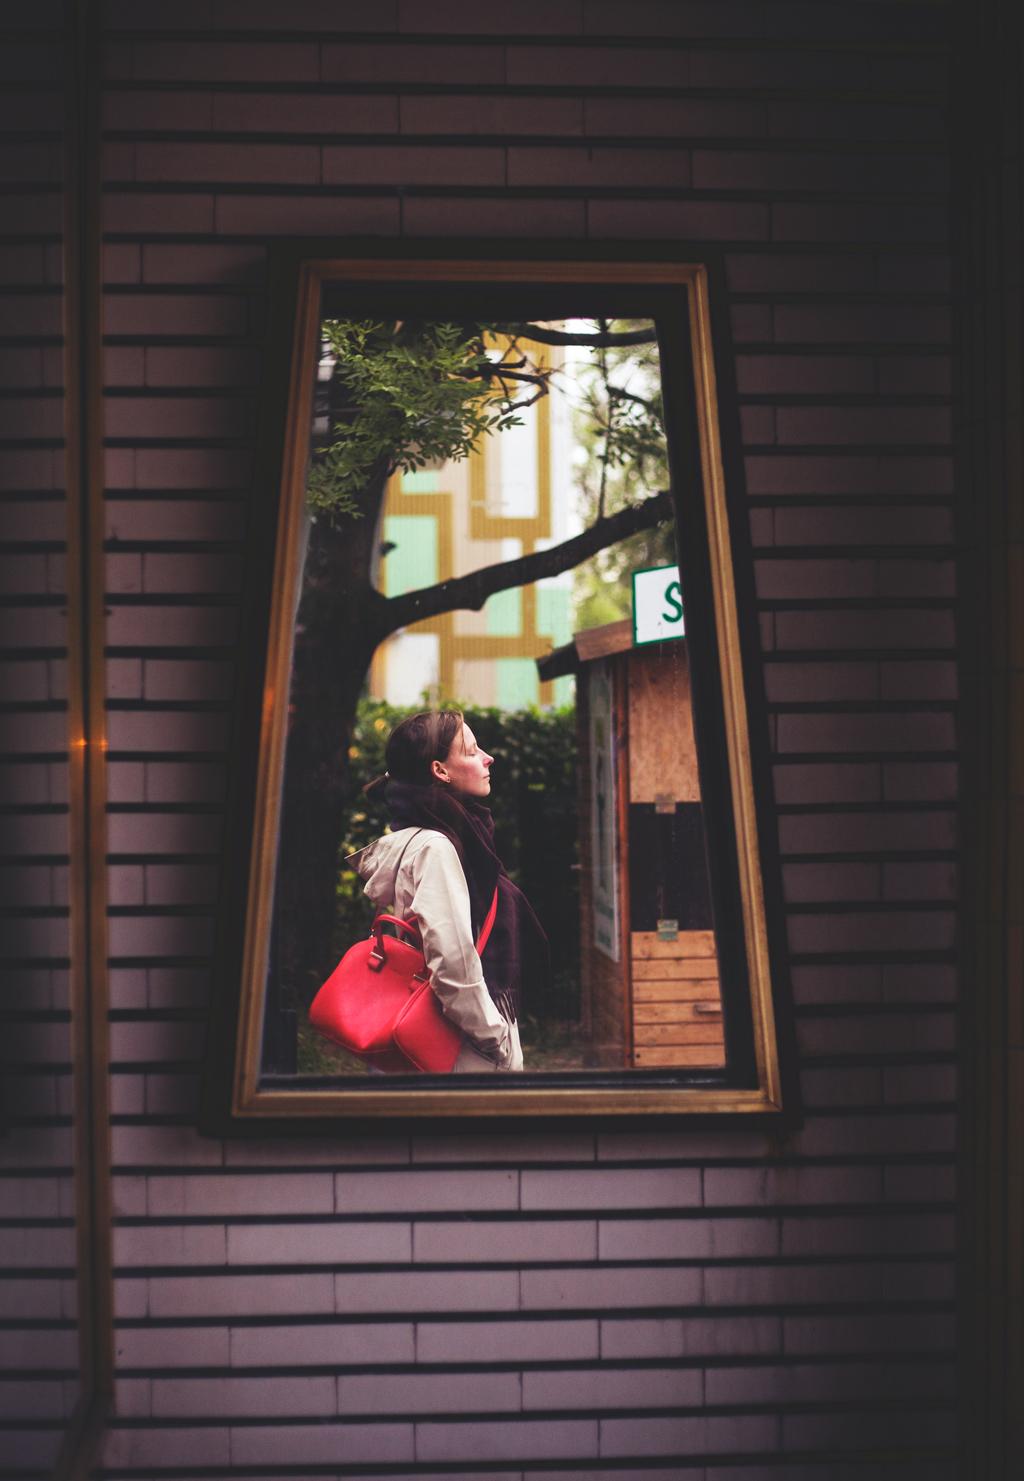 331/365 - selfie in a frame